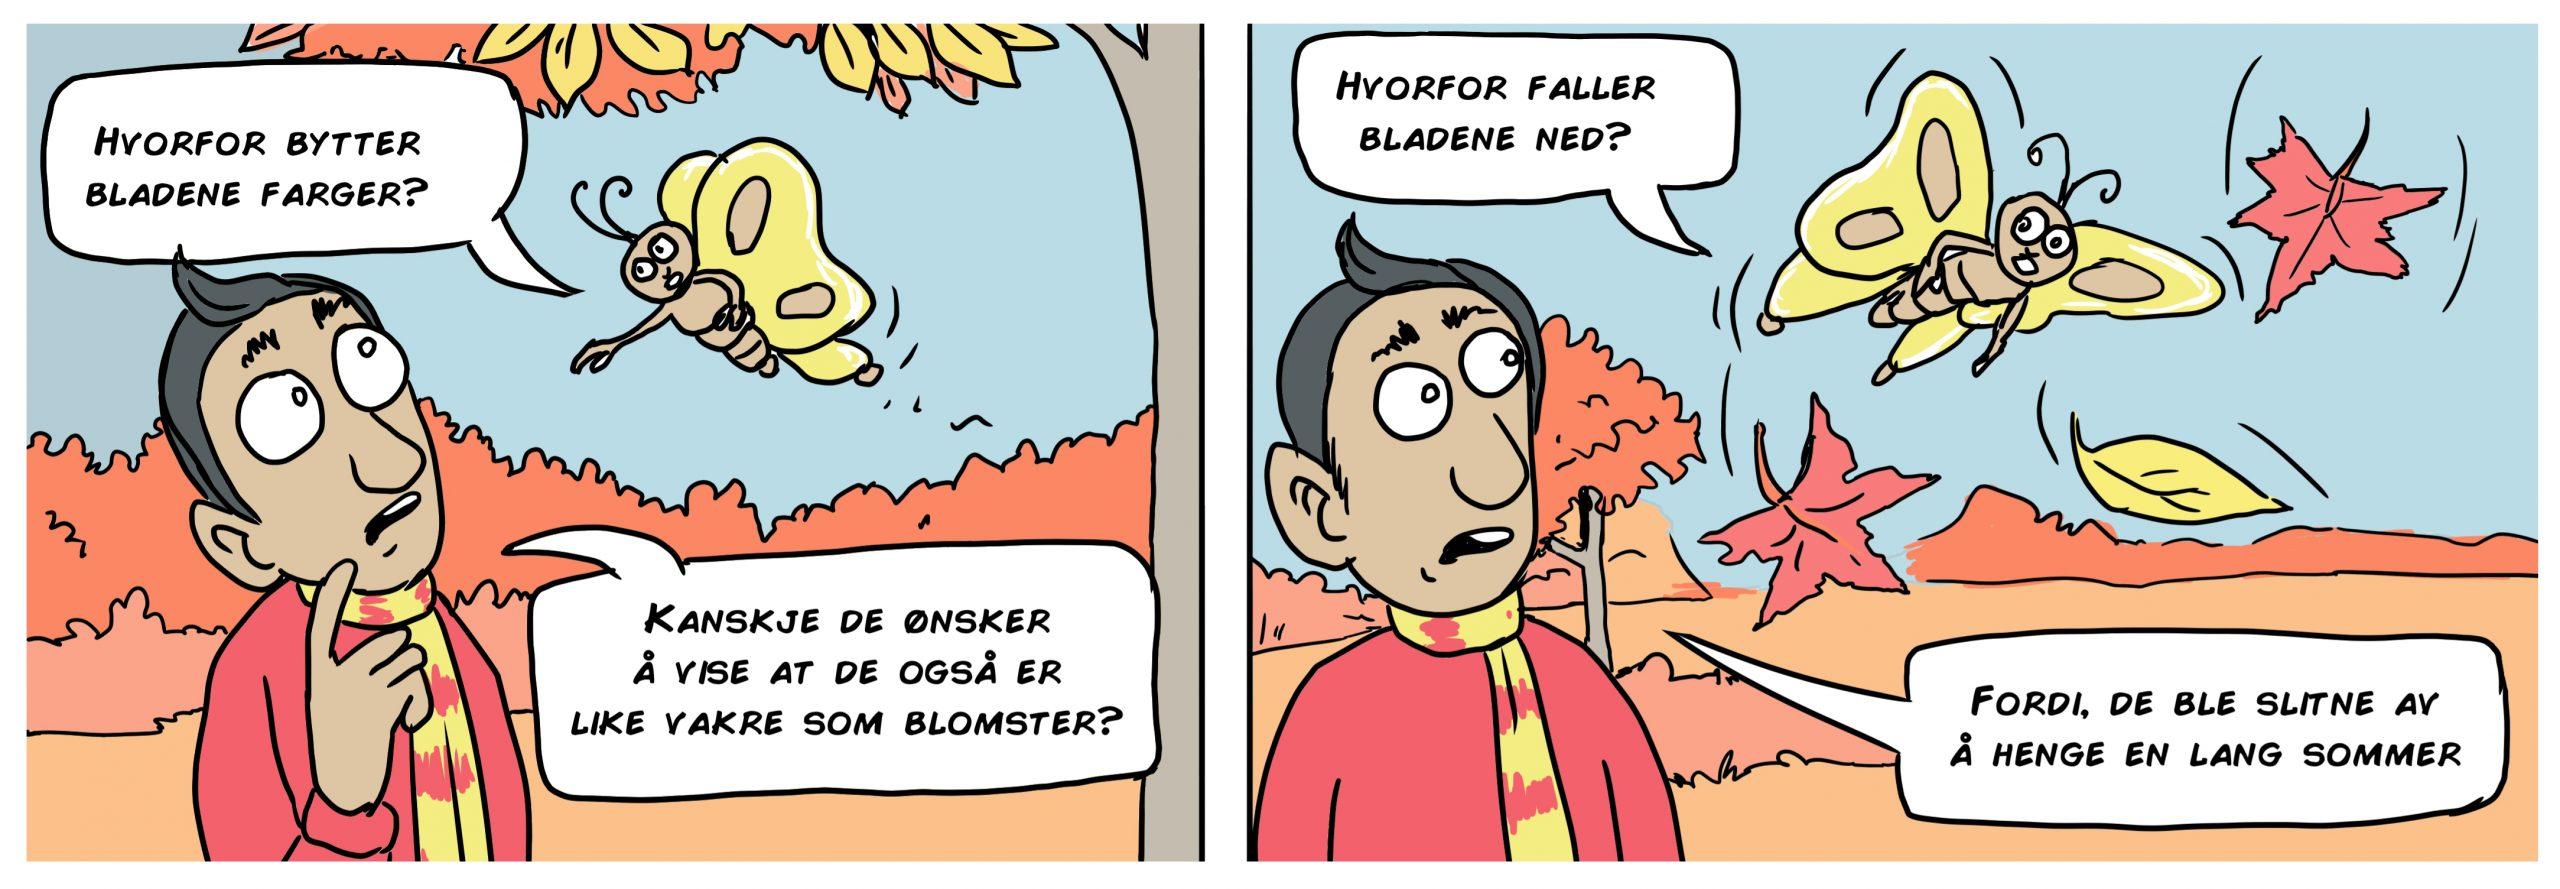 Autumn Høst